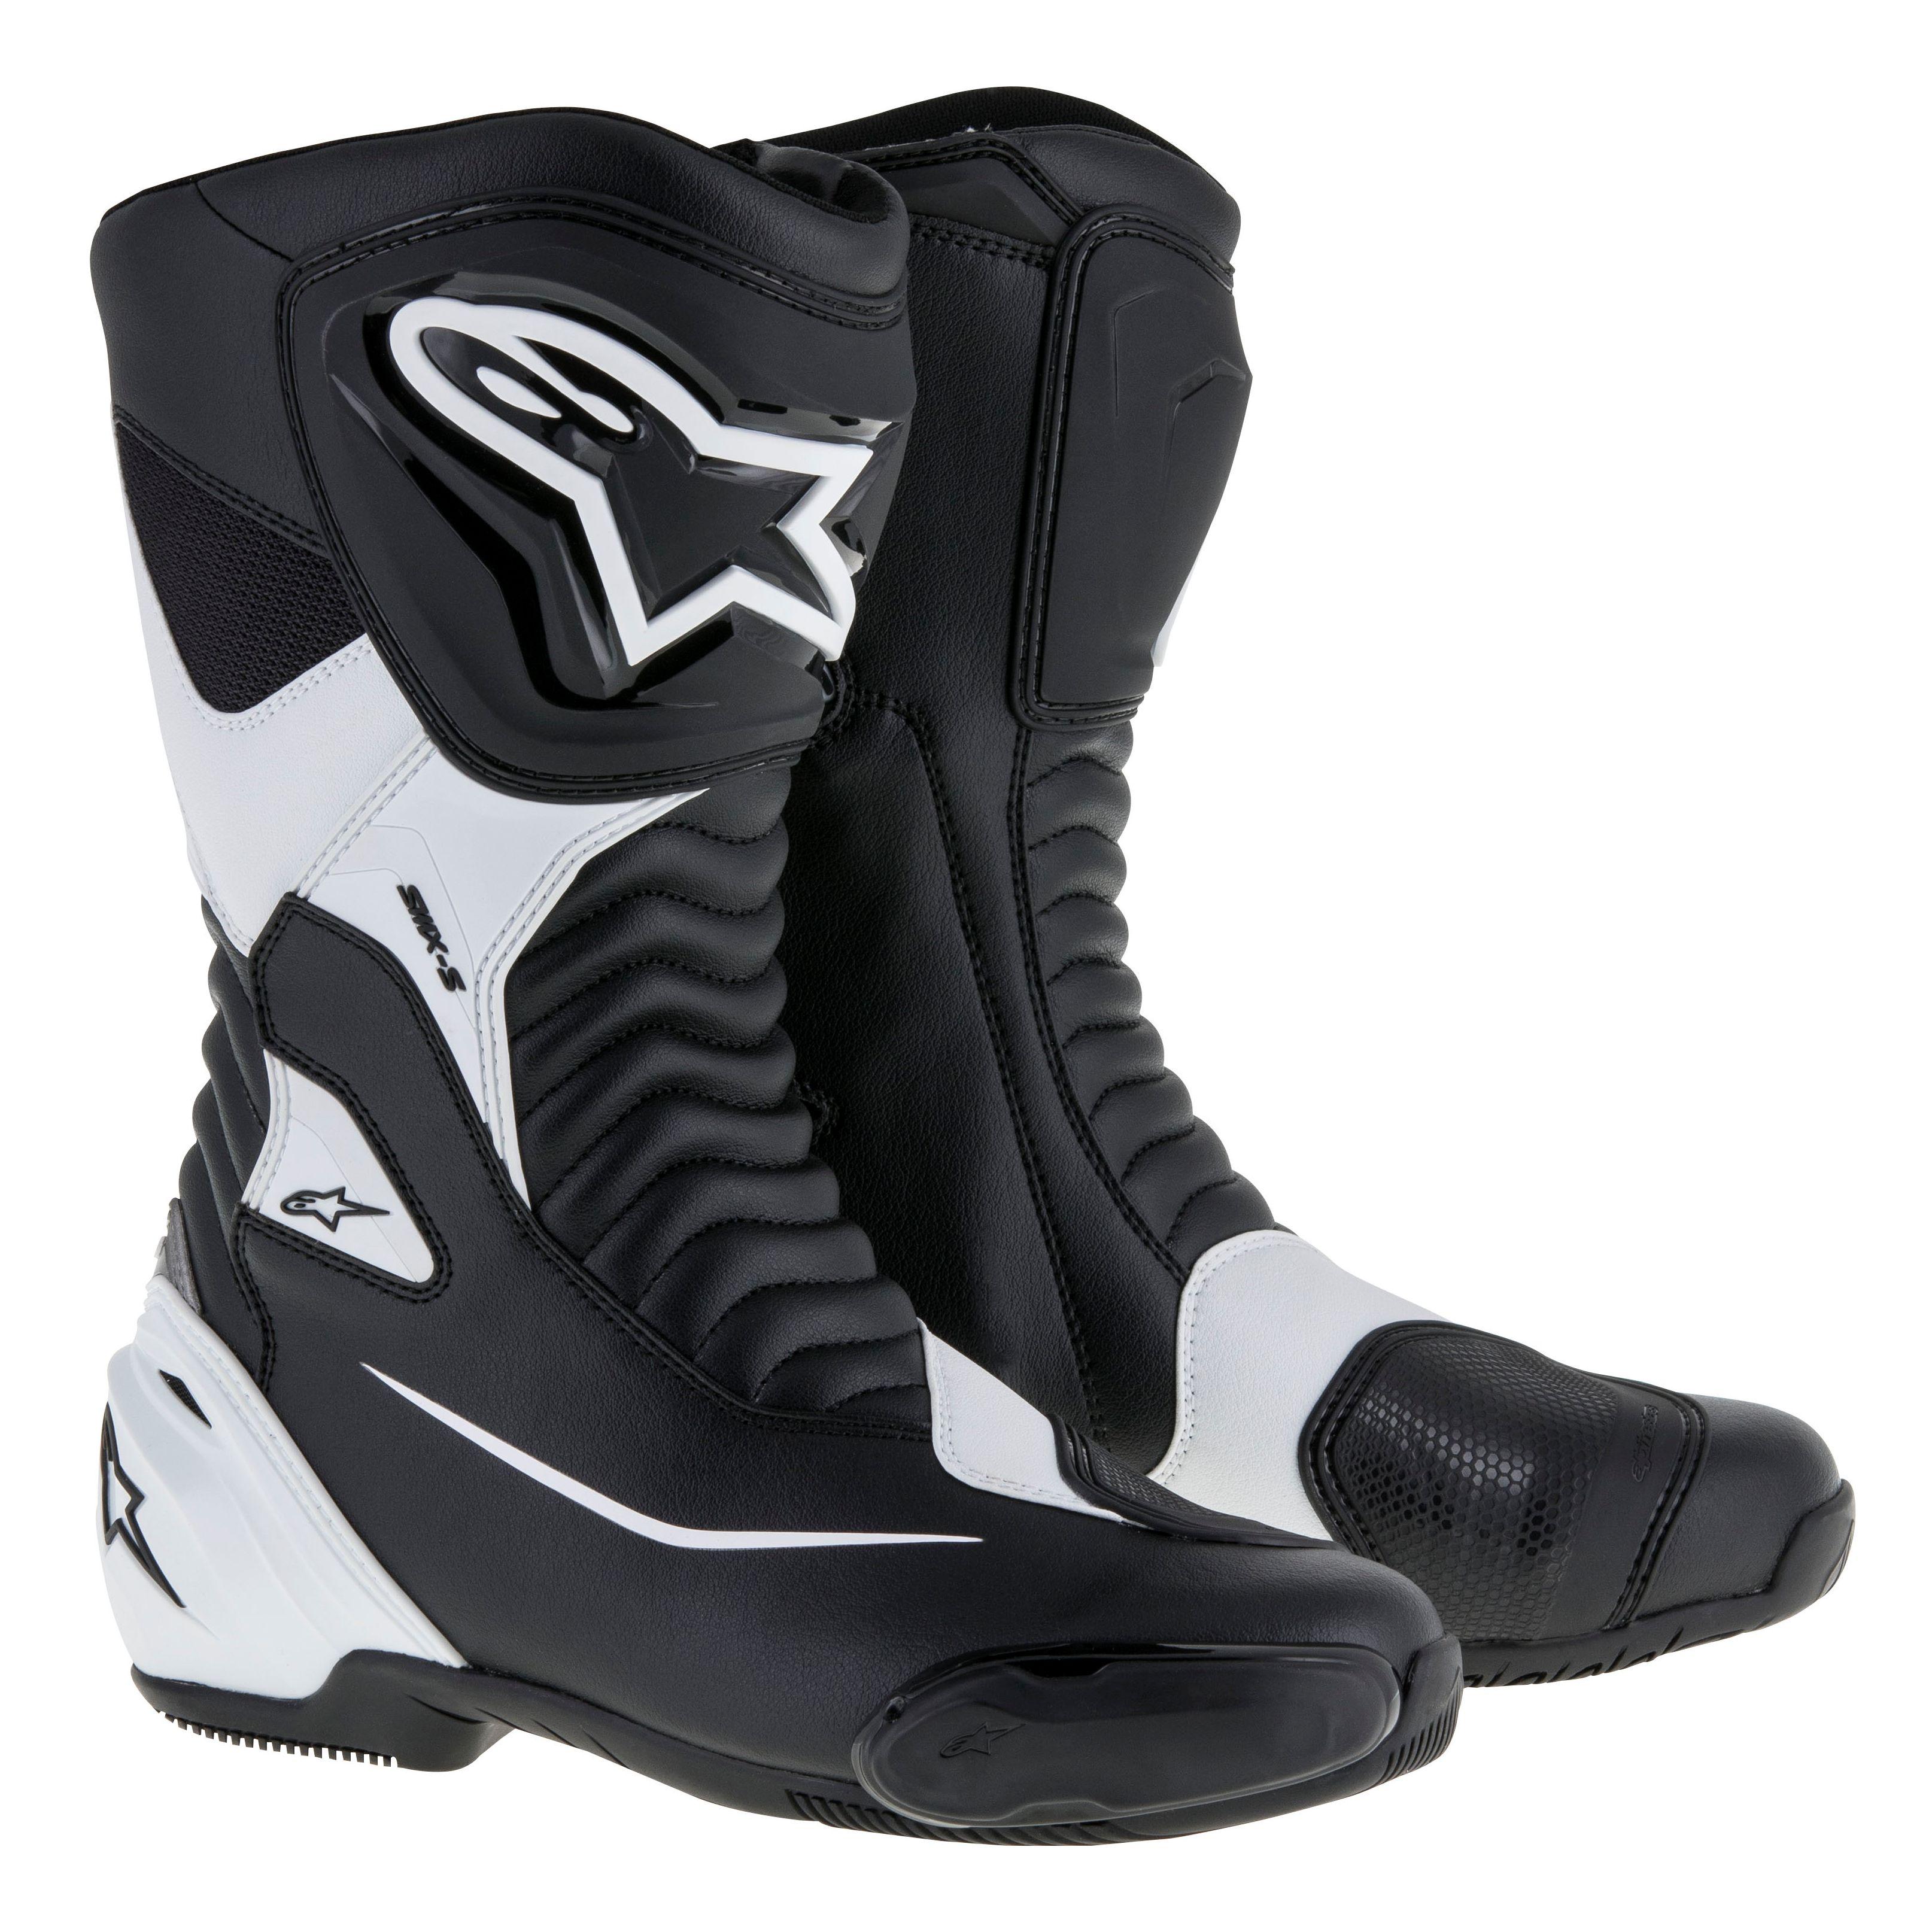 bottes smx s alpinestars noir blanc